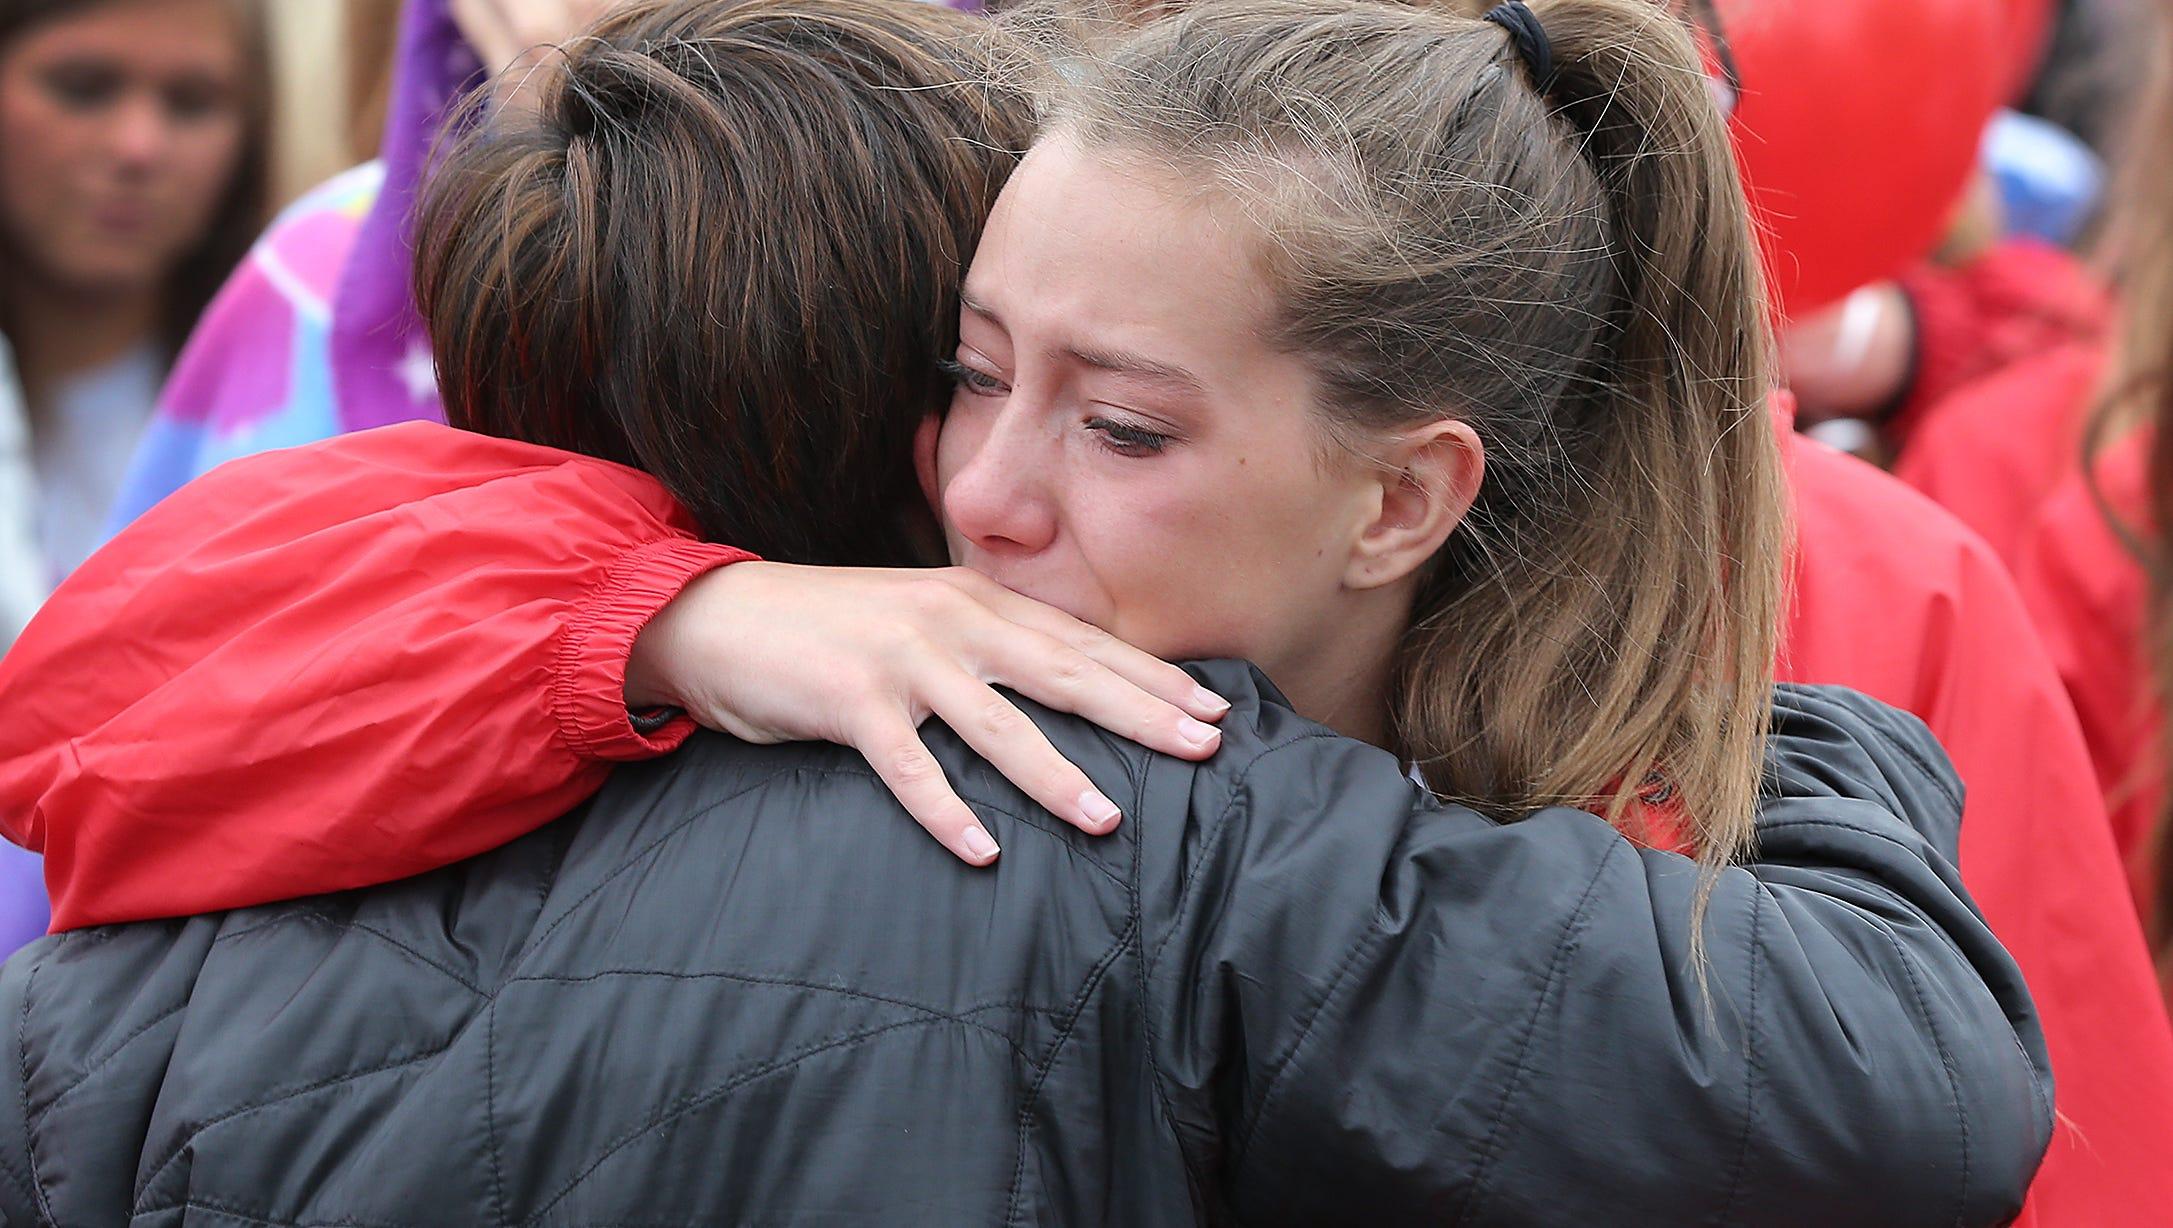 Thousands Honor Slain Iu Student In 2 Vigils